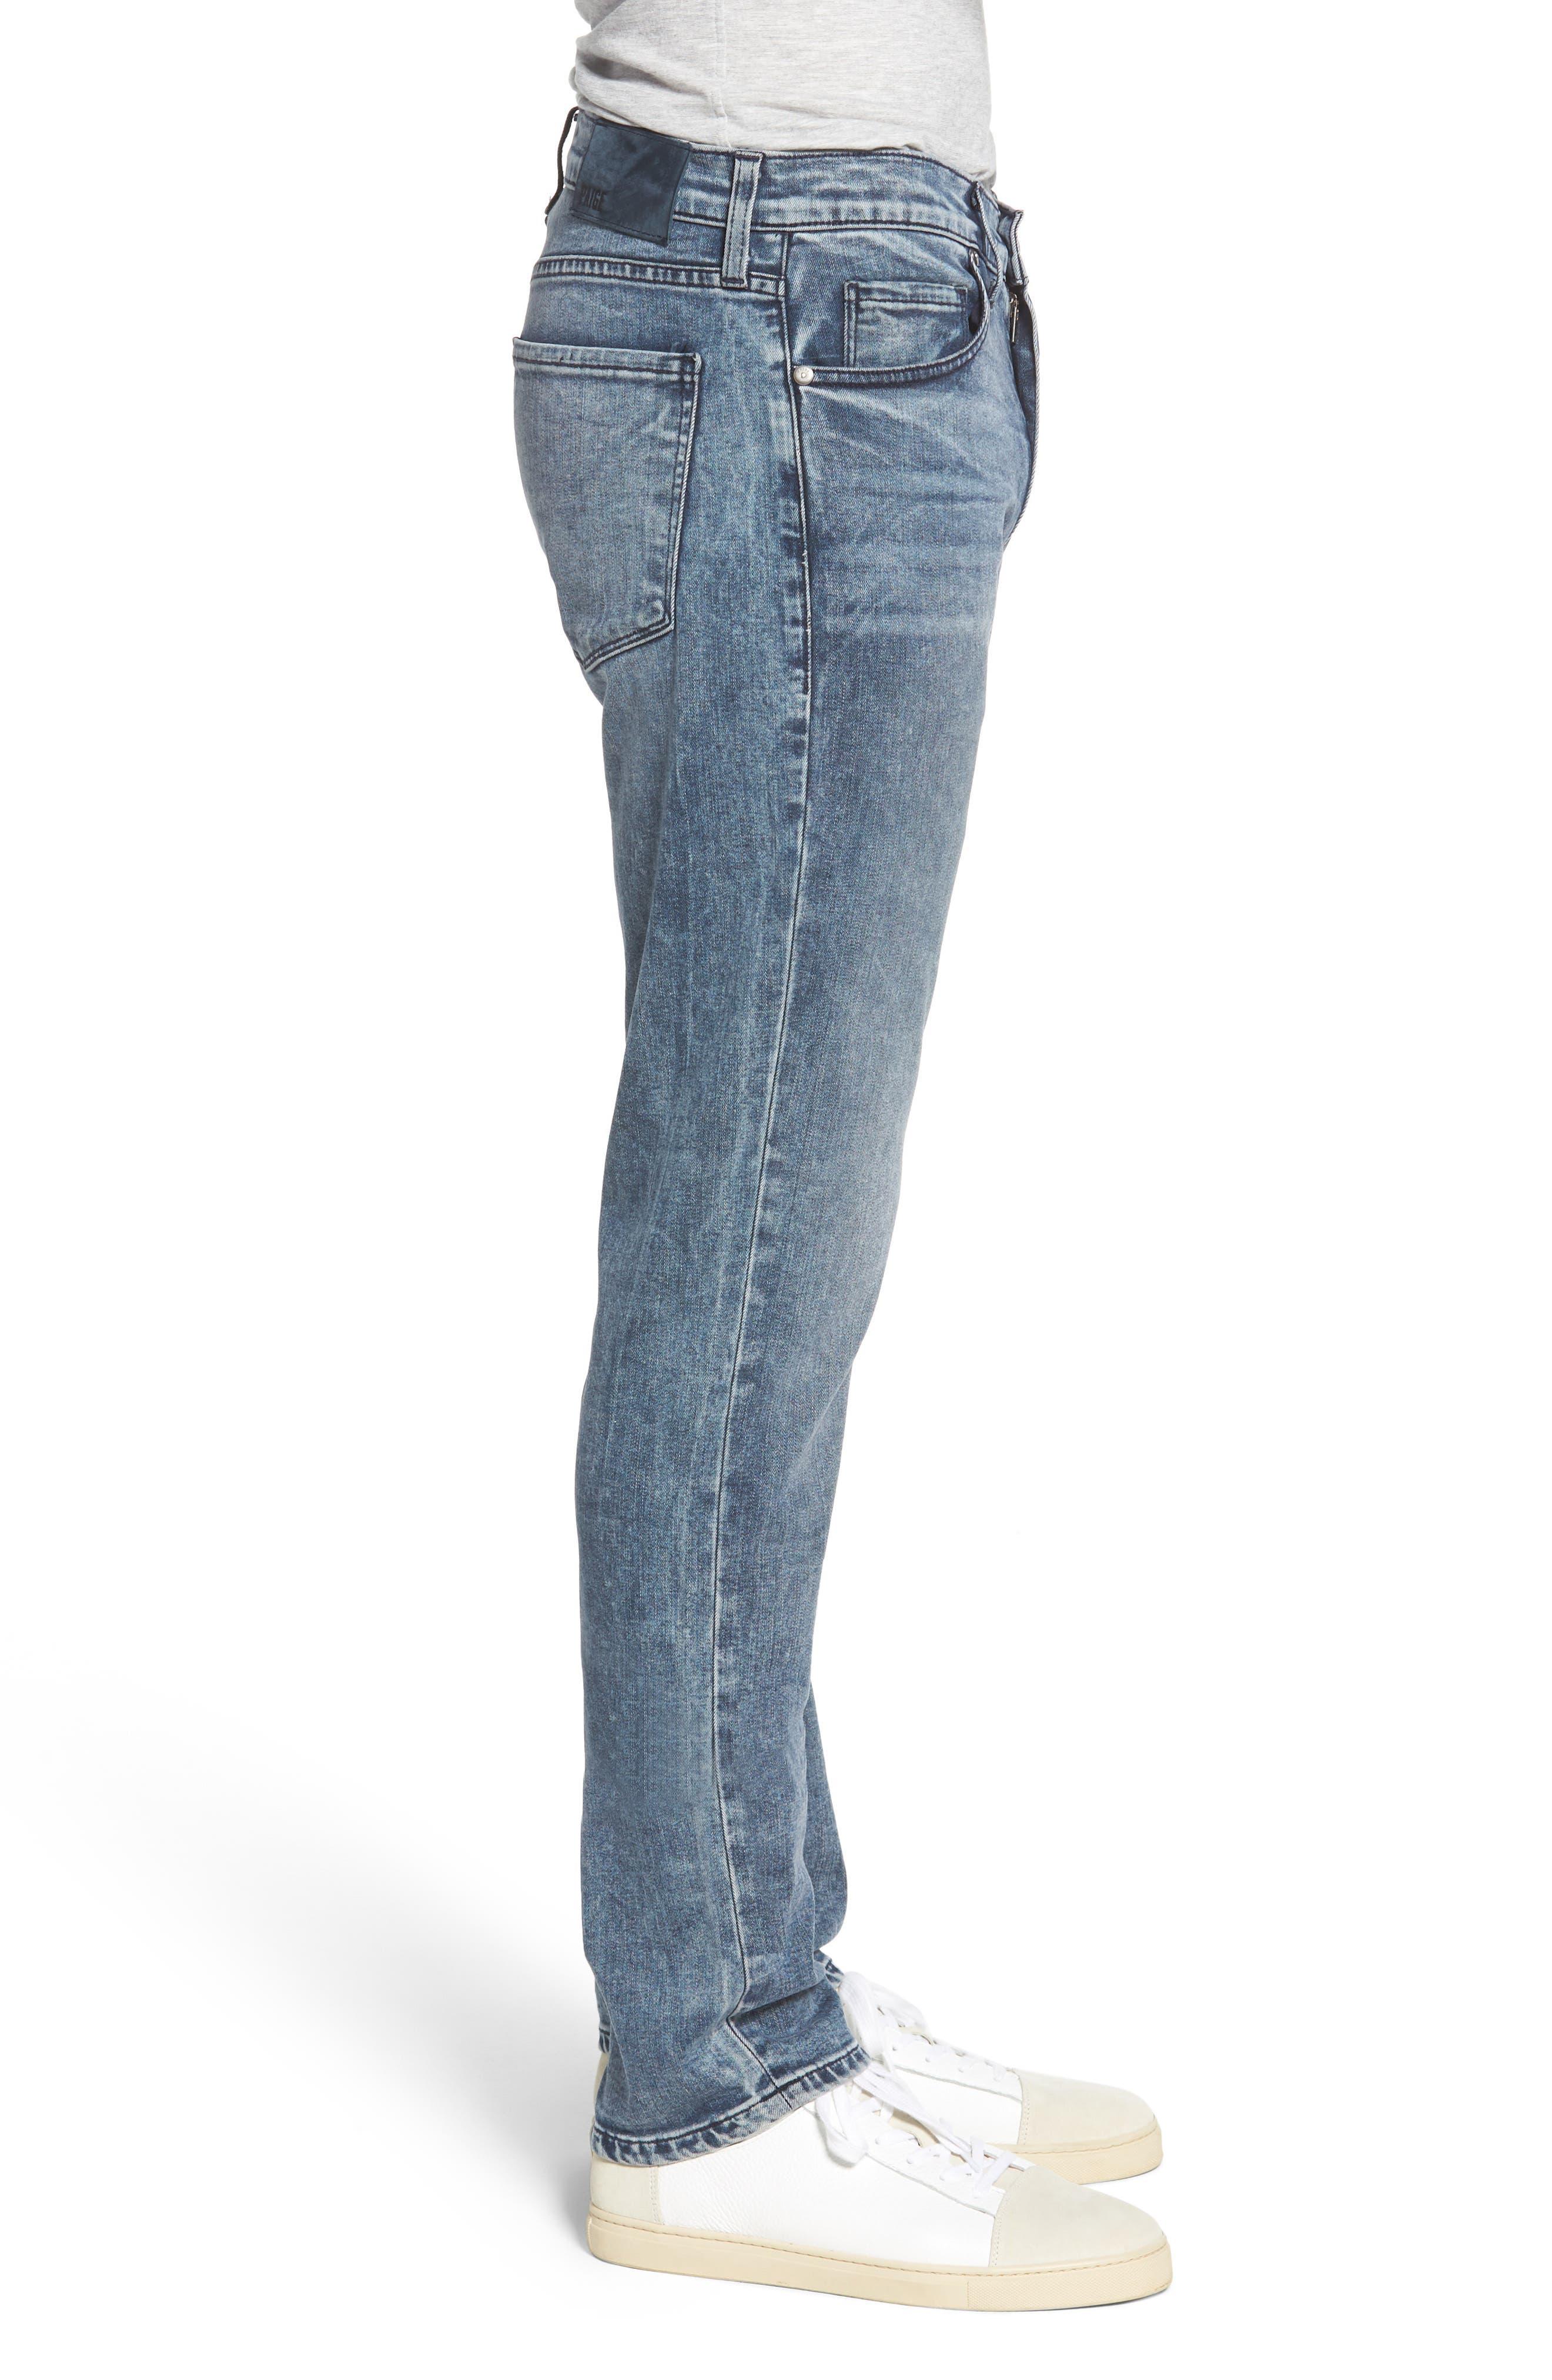 Transcend - Lennox Slim Fit Jeans,                             Alternate thumbnail 3, color,                             Higgs